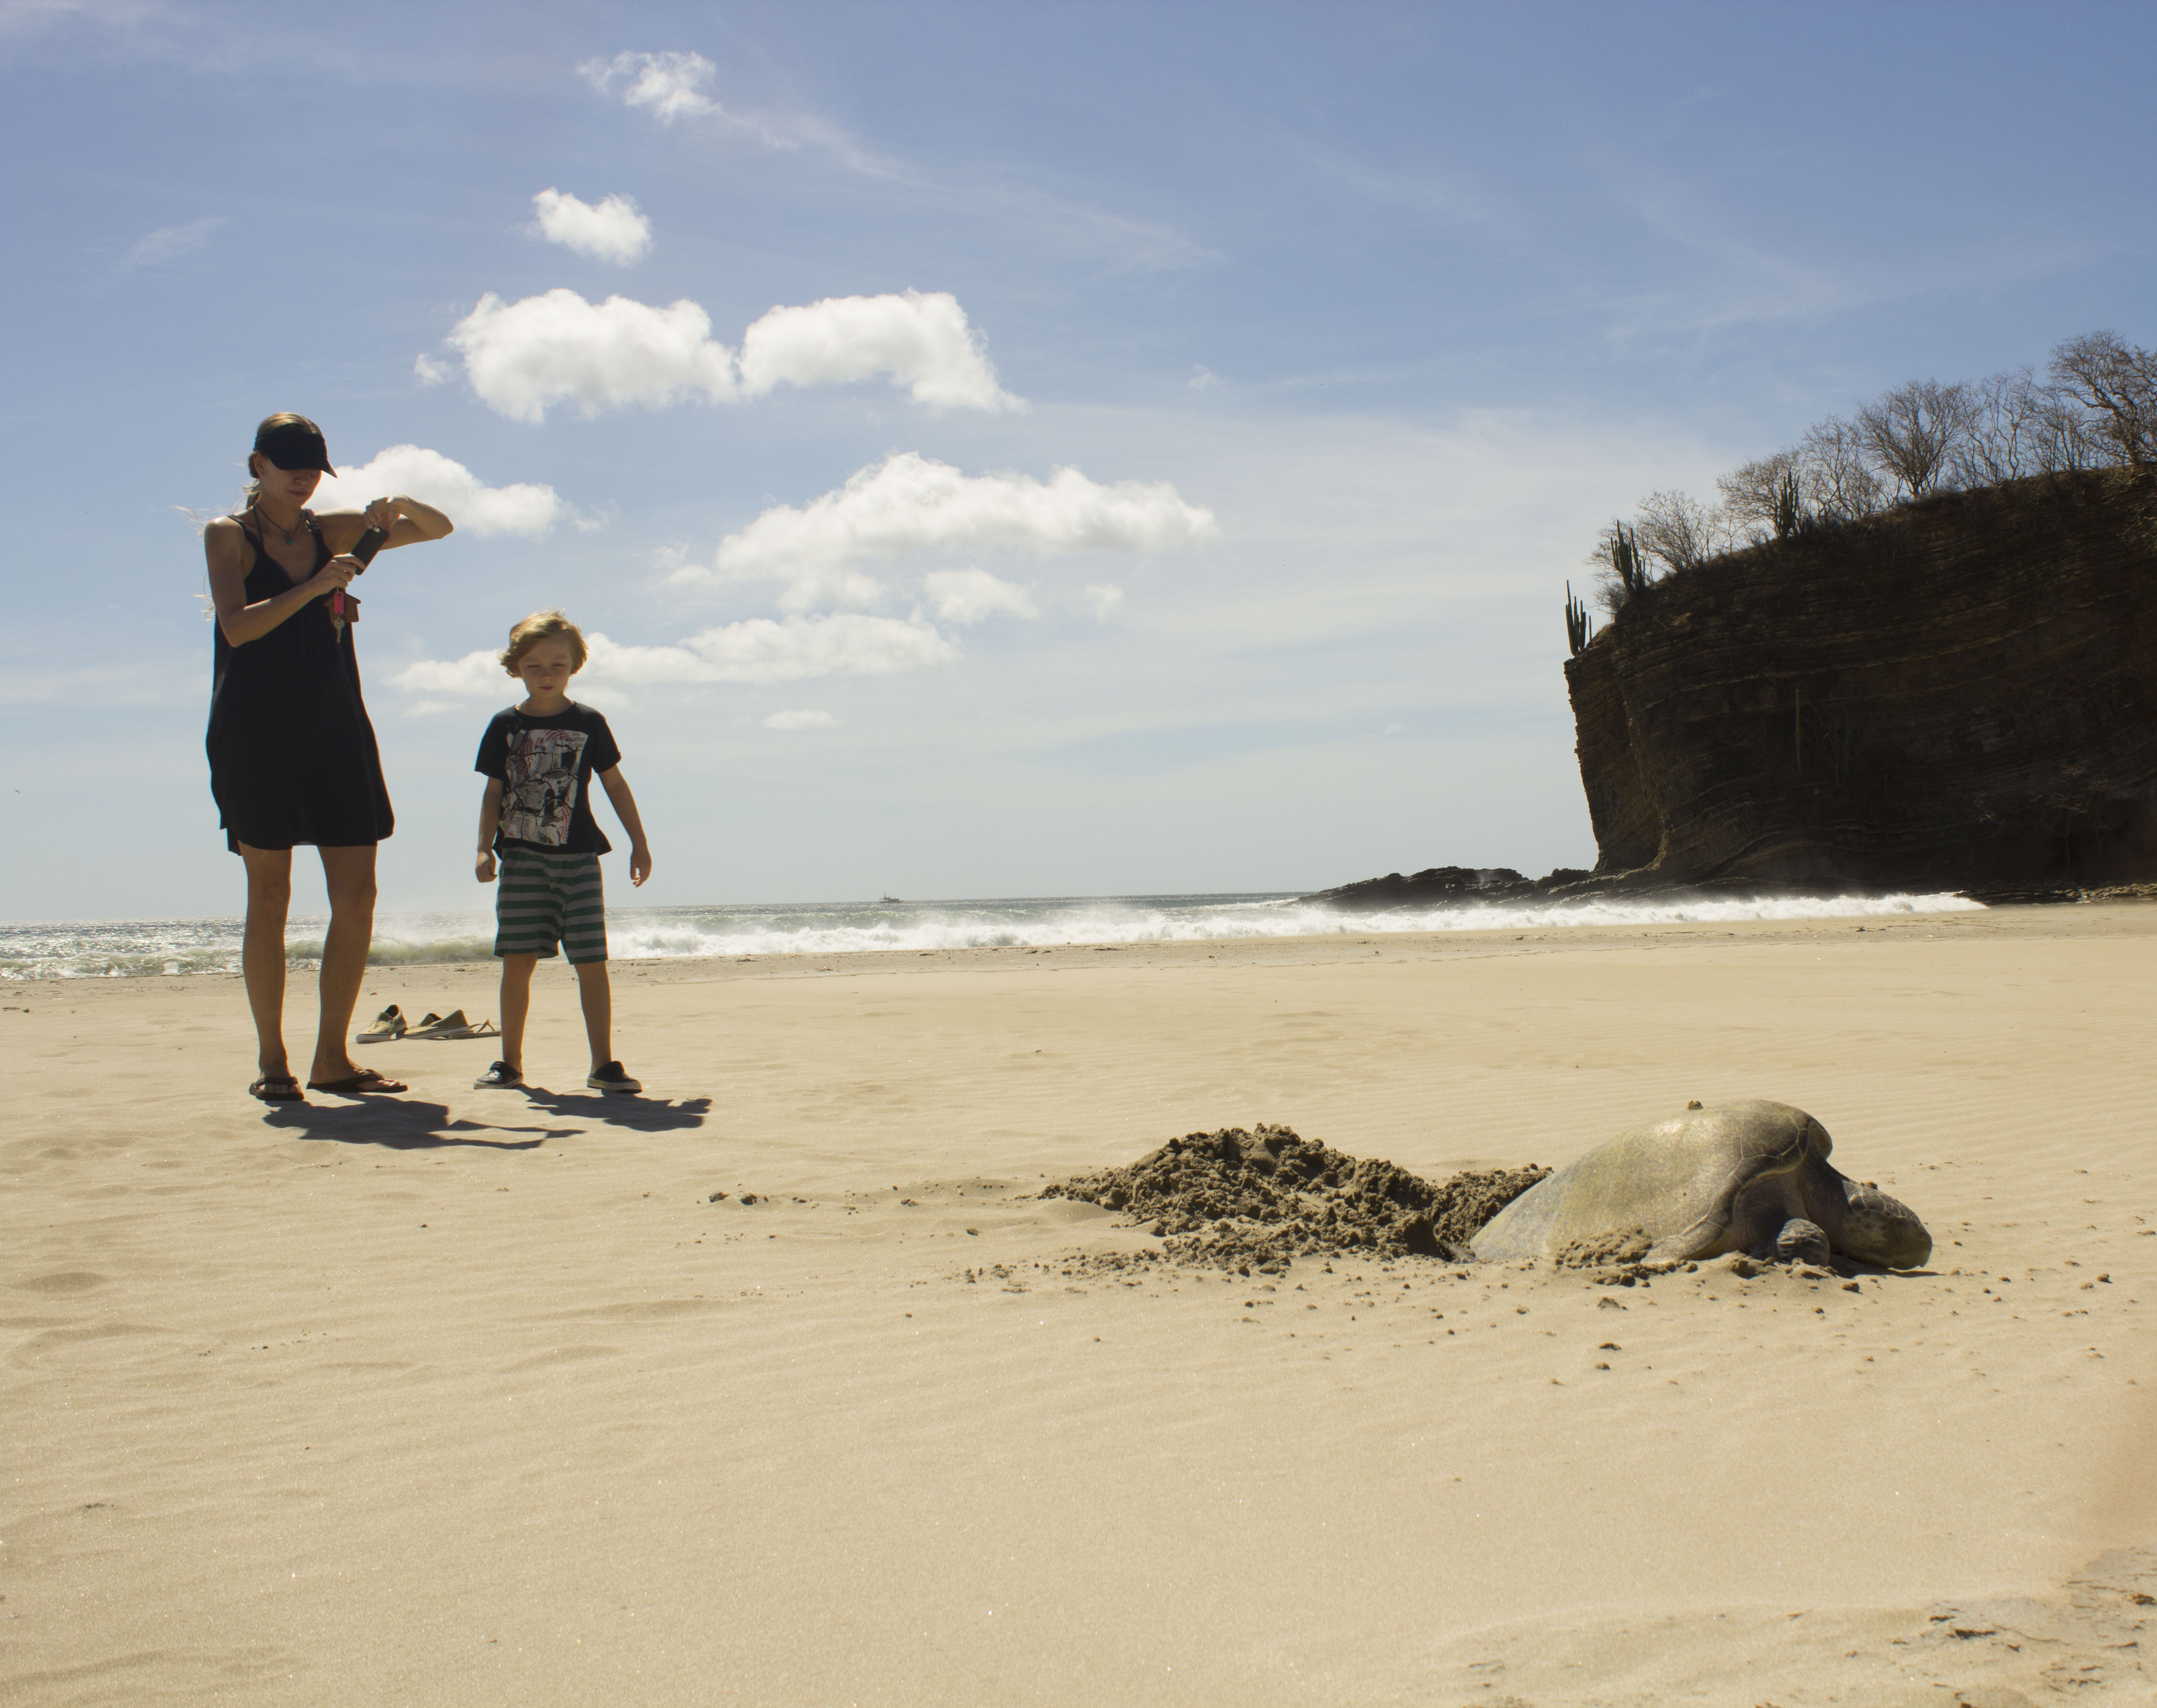 La Veranera Playa Coco turtle